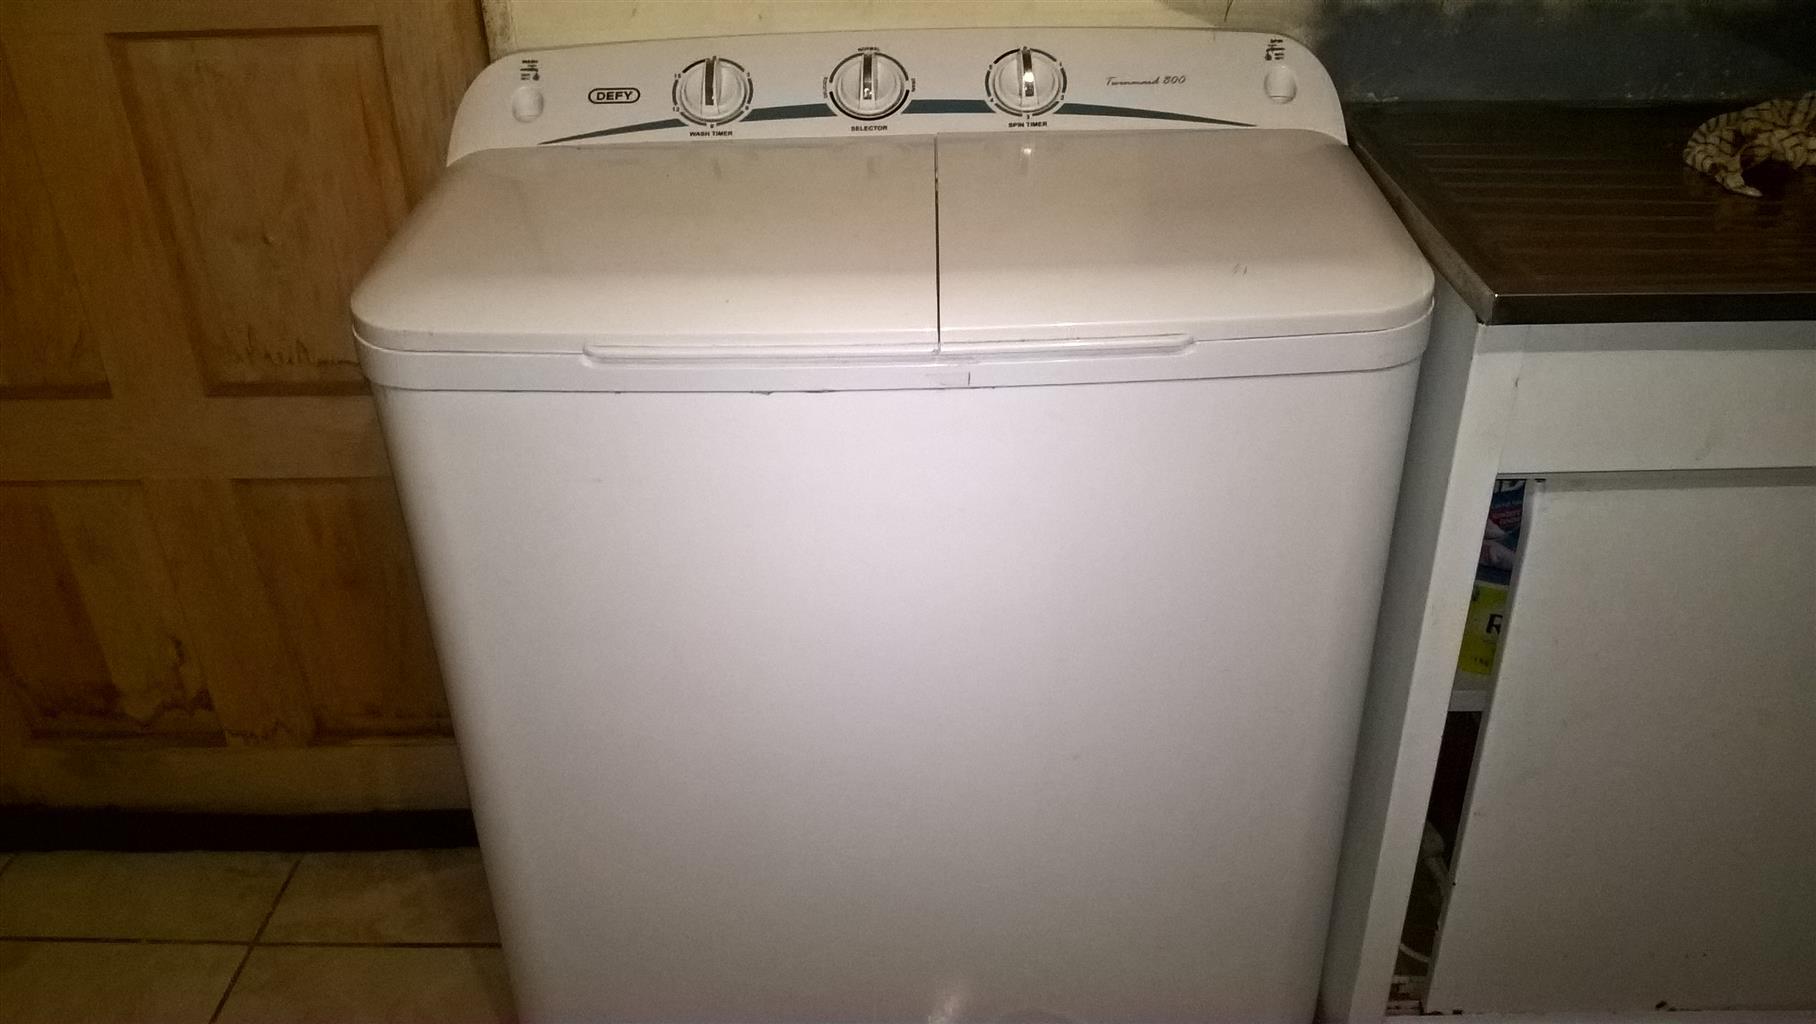 Defy Washing machine for sale.